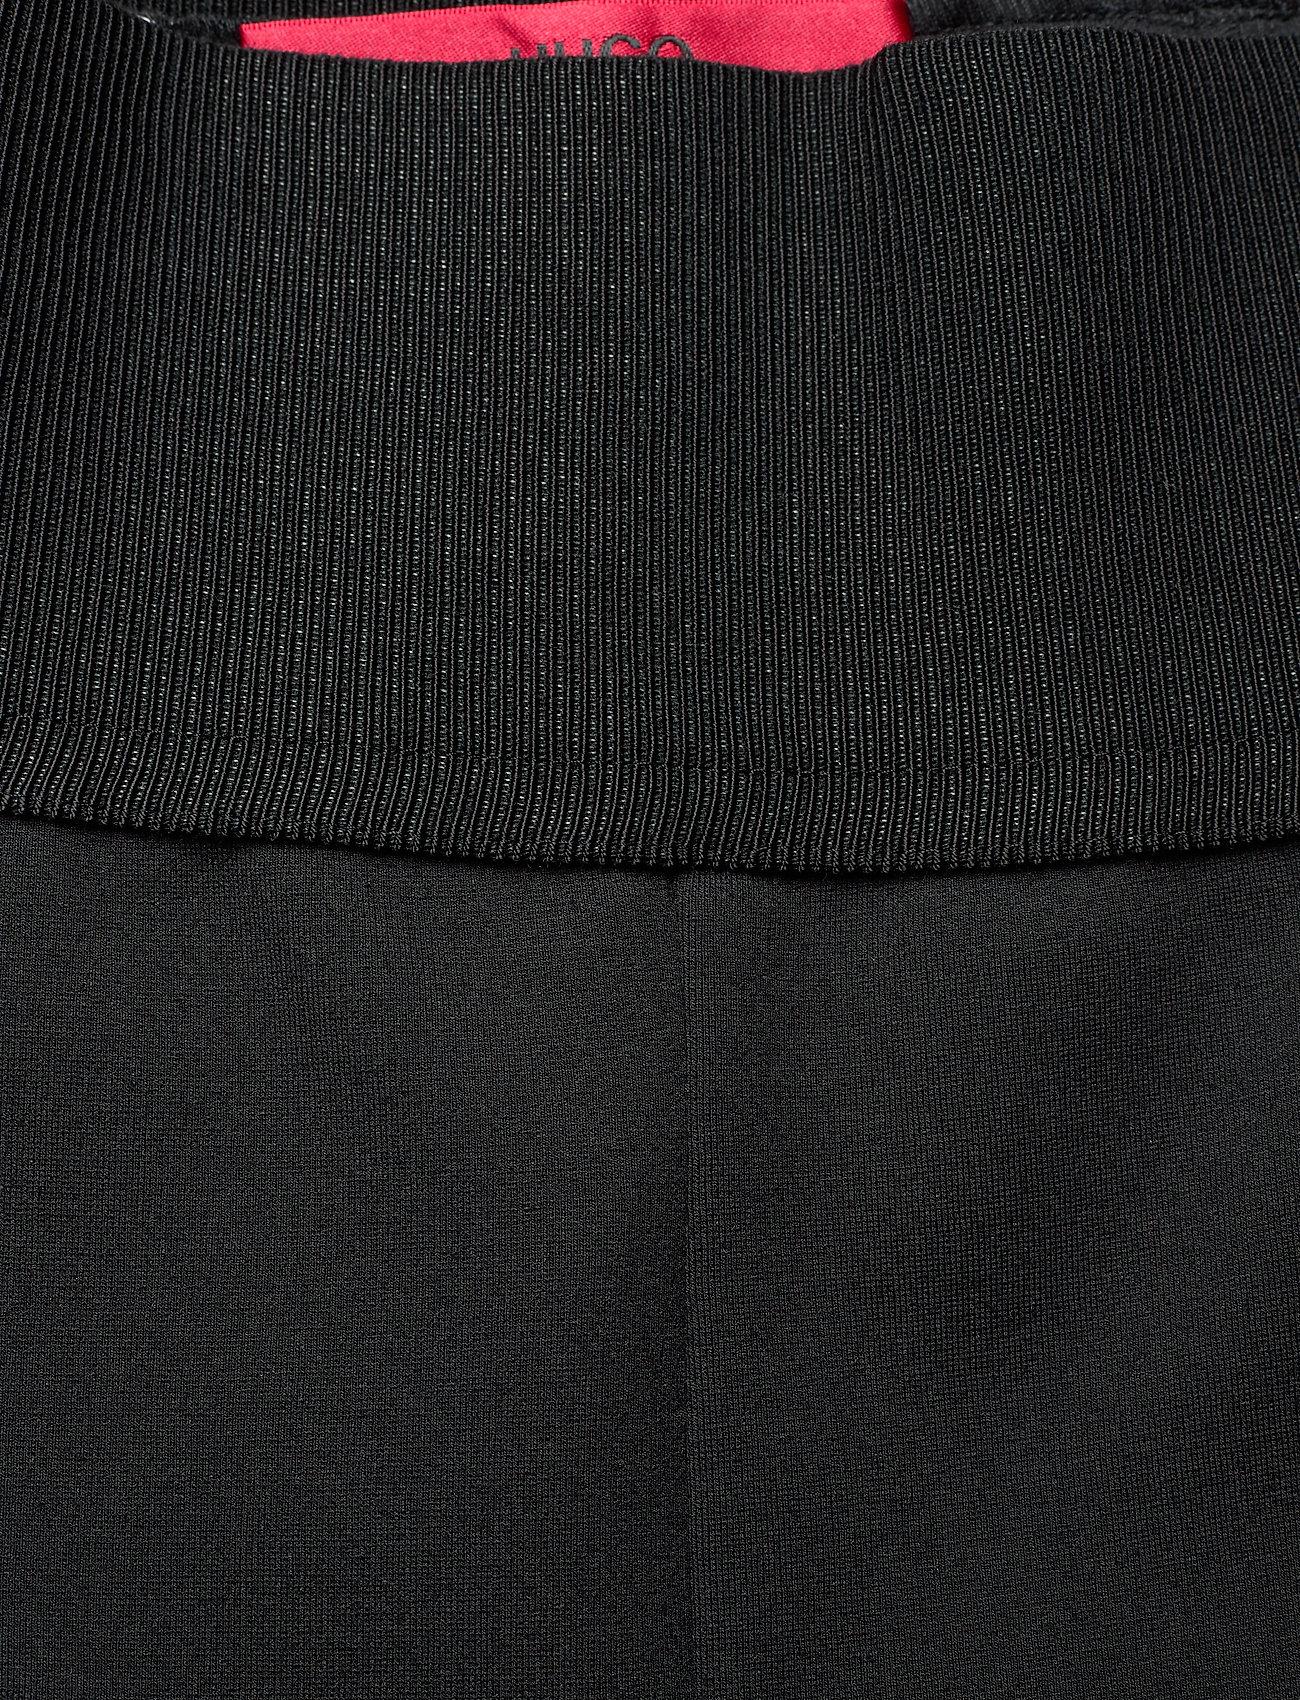 Hiruba-1 (Black) (959.40 kr) - HUGO